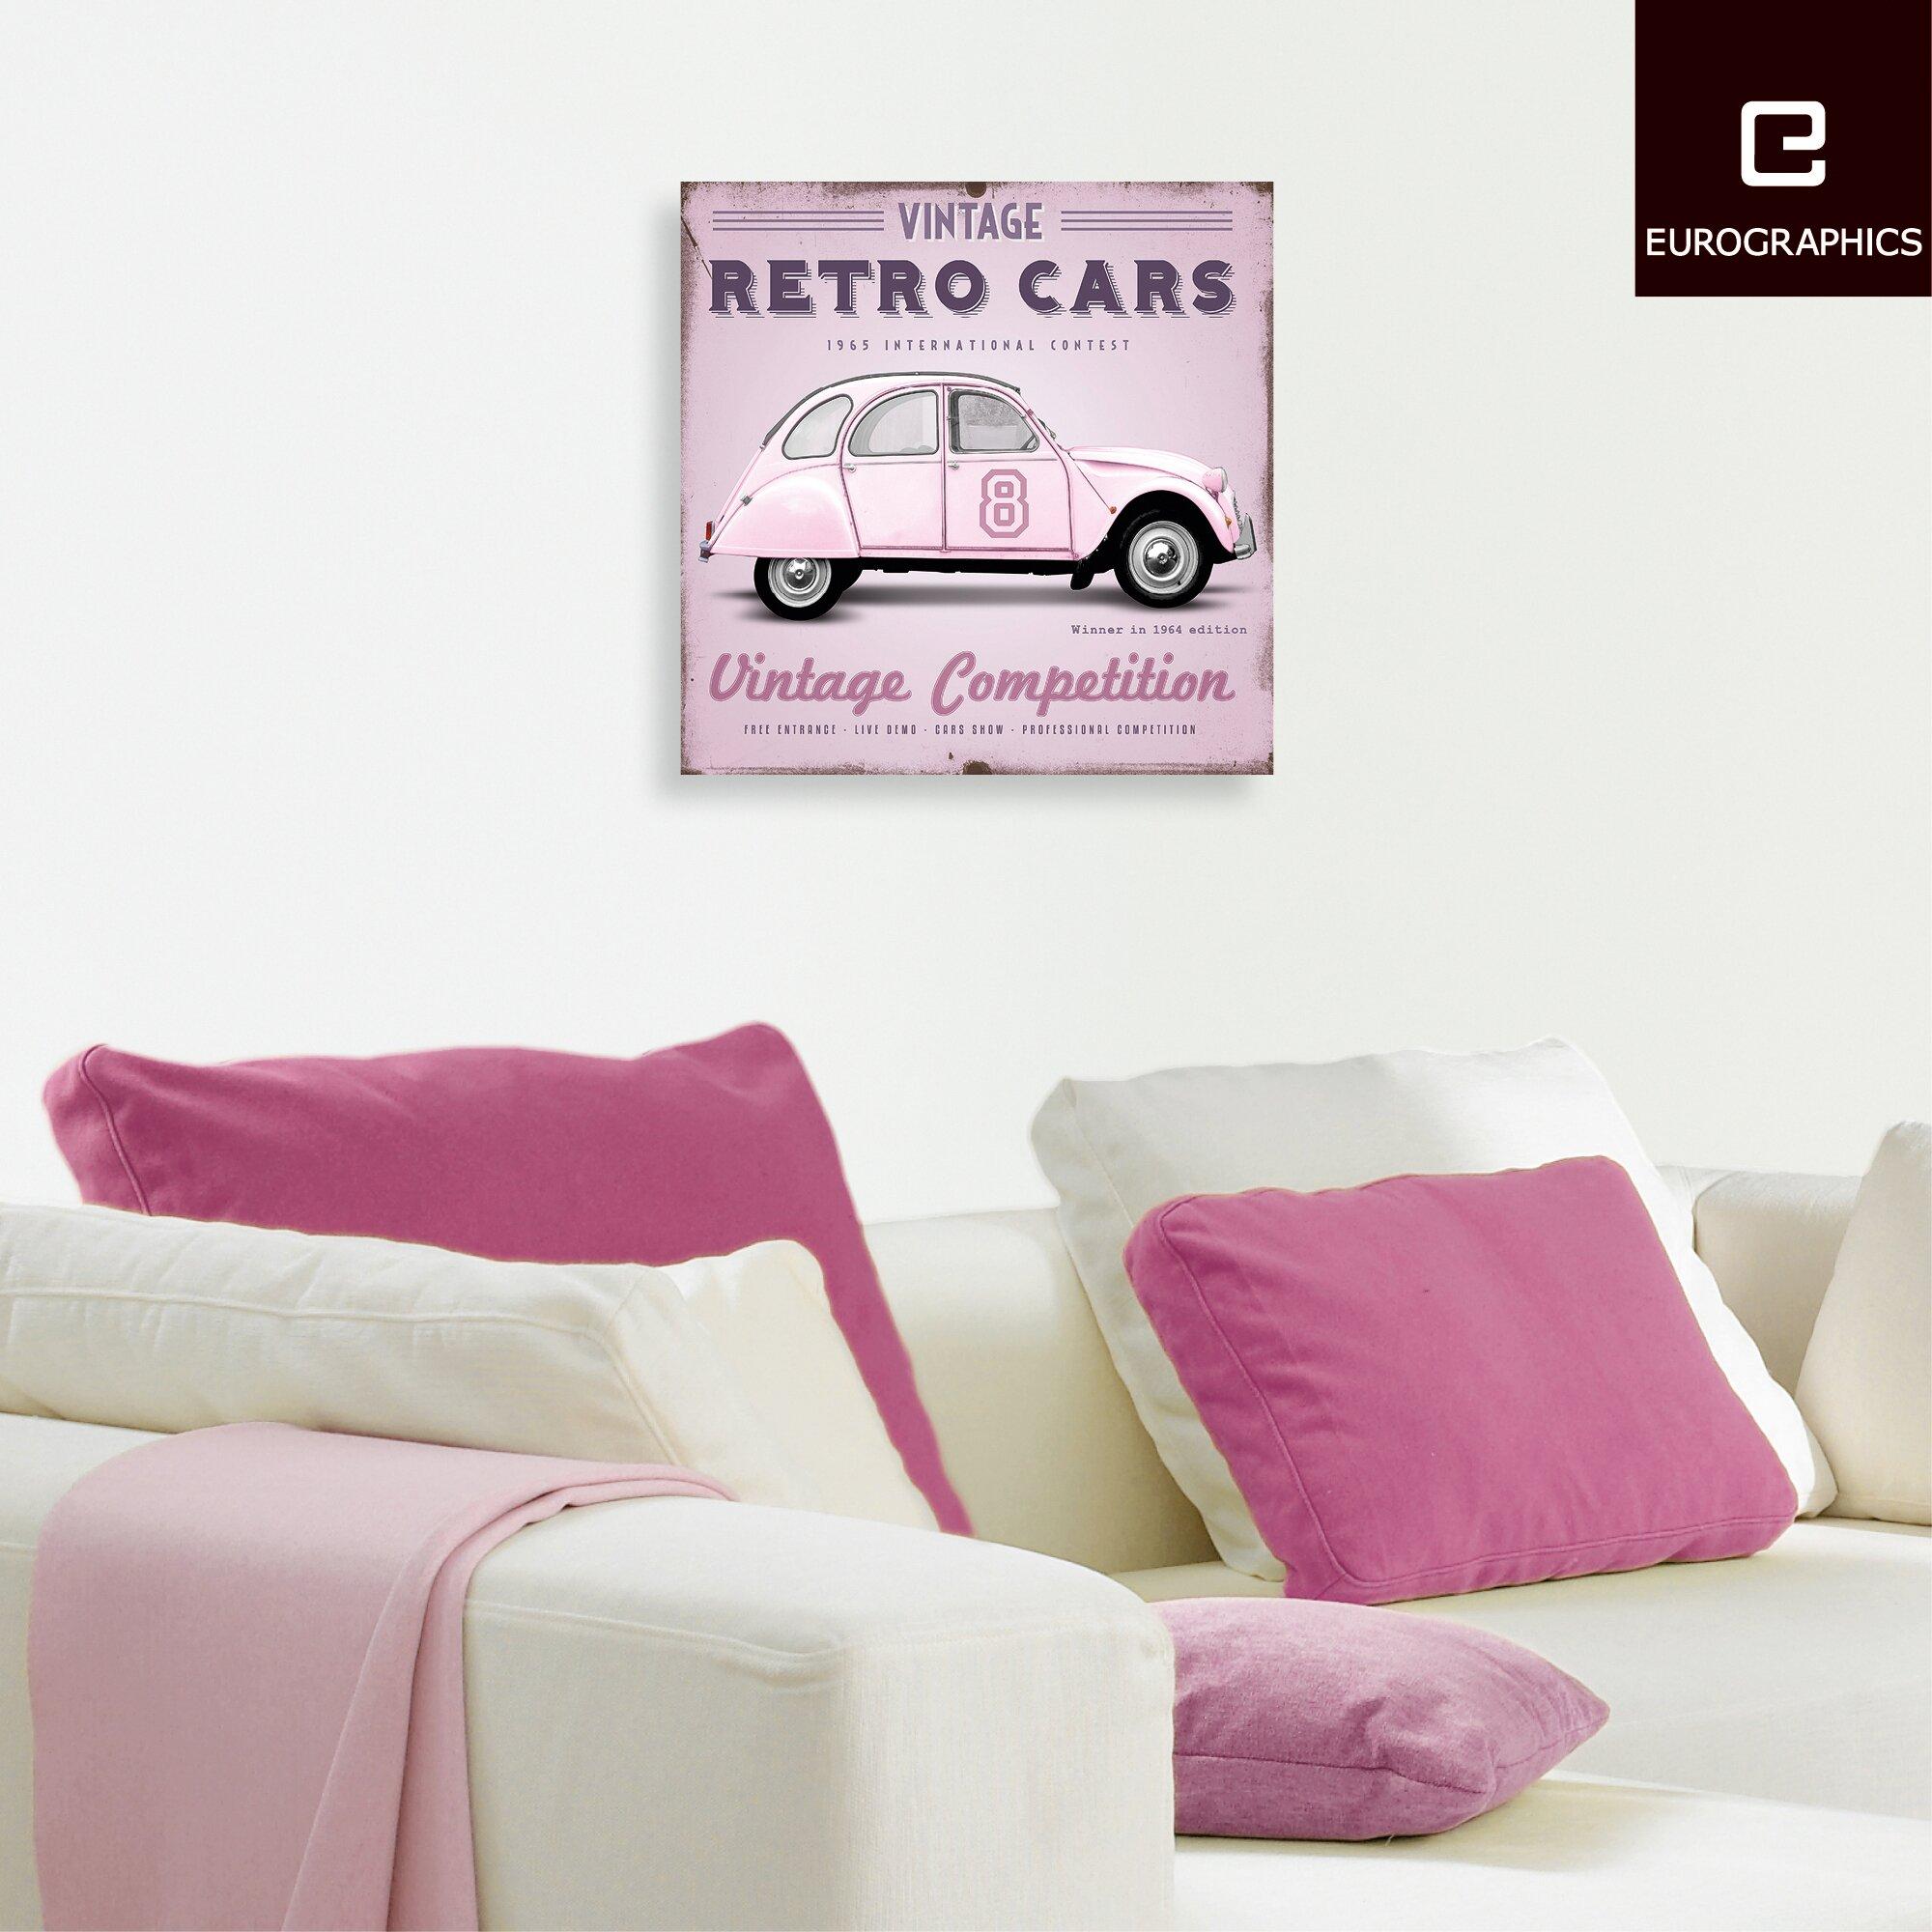 Eurographics Retro Cars by Design Studio Wall Art Reviews